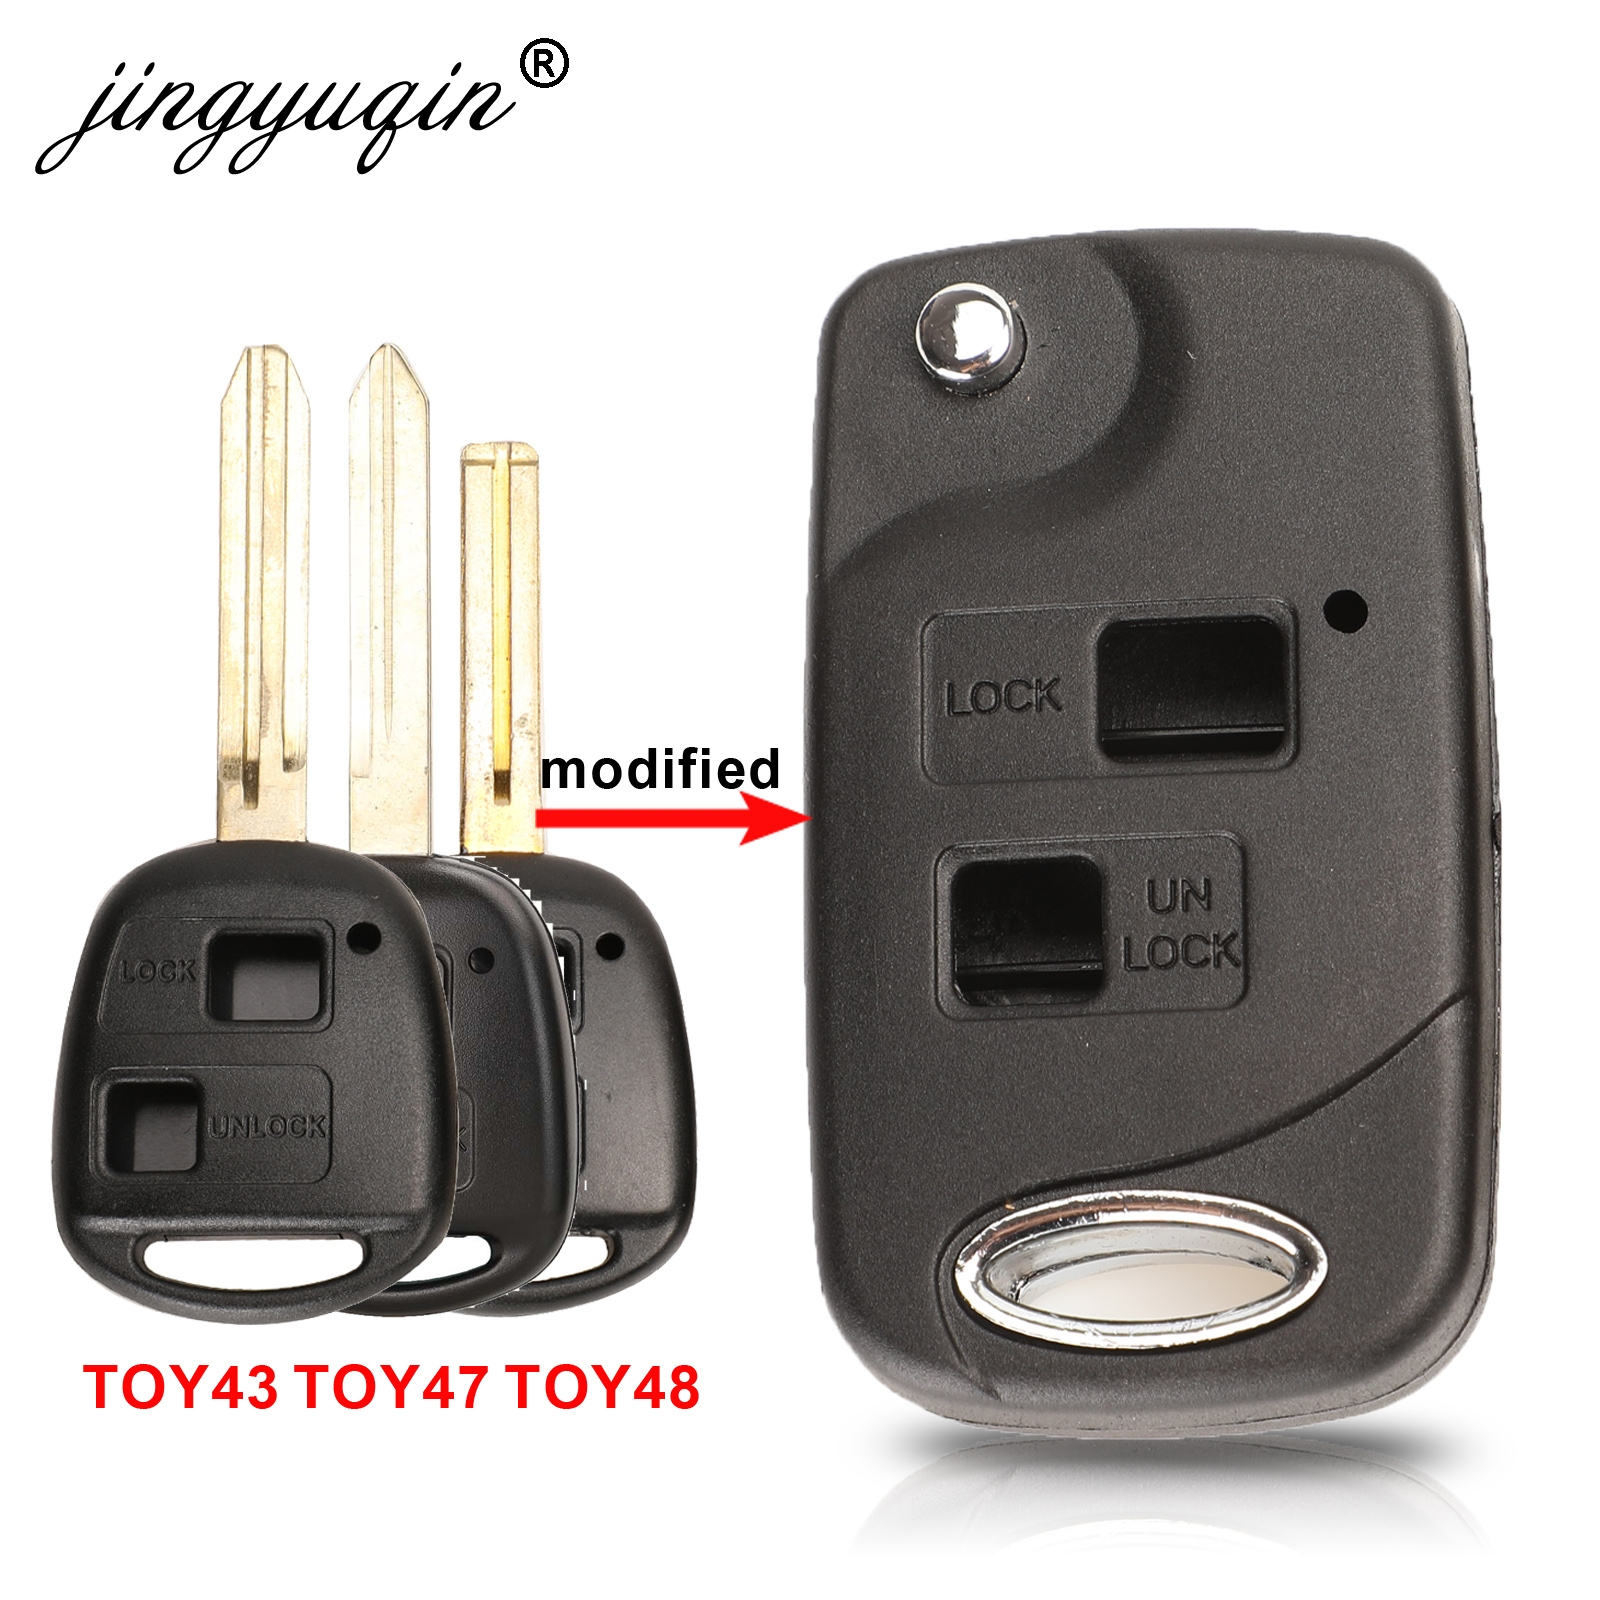 Чехол-брелок jingyuqin для Toyota RAV4 Avalon Echo Prado Tarago Camry Tarago TOY43 / TOY47 TOY48